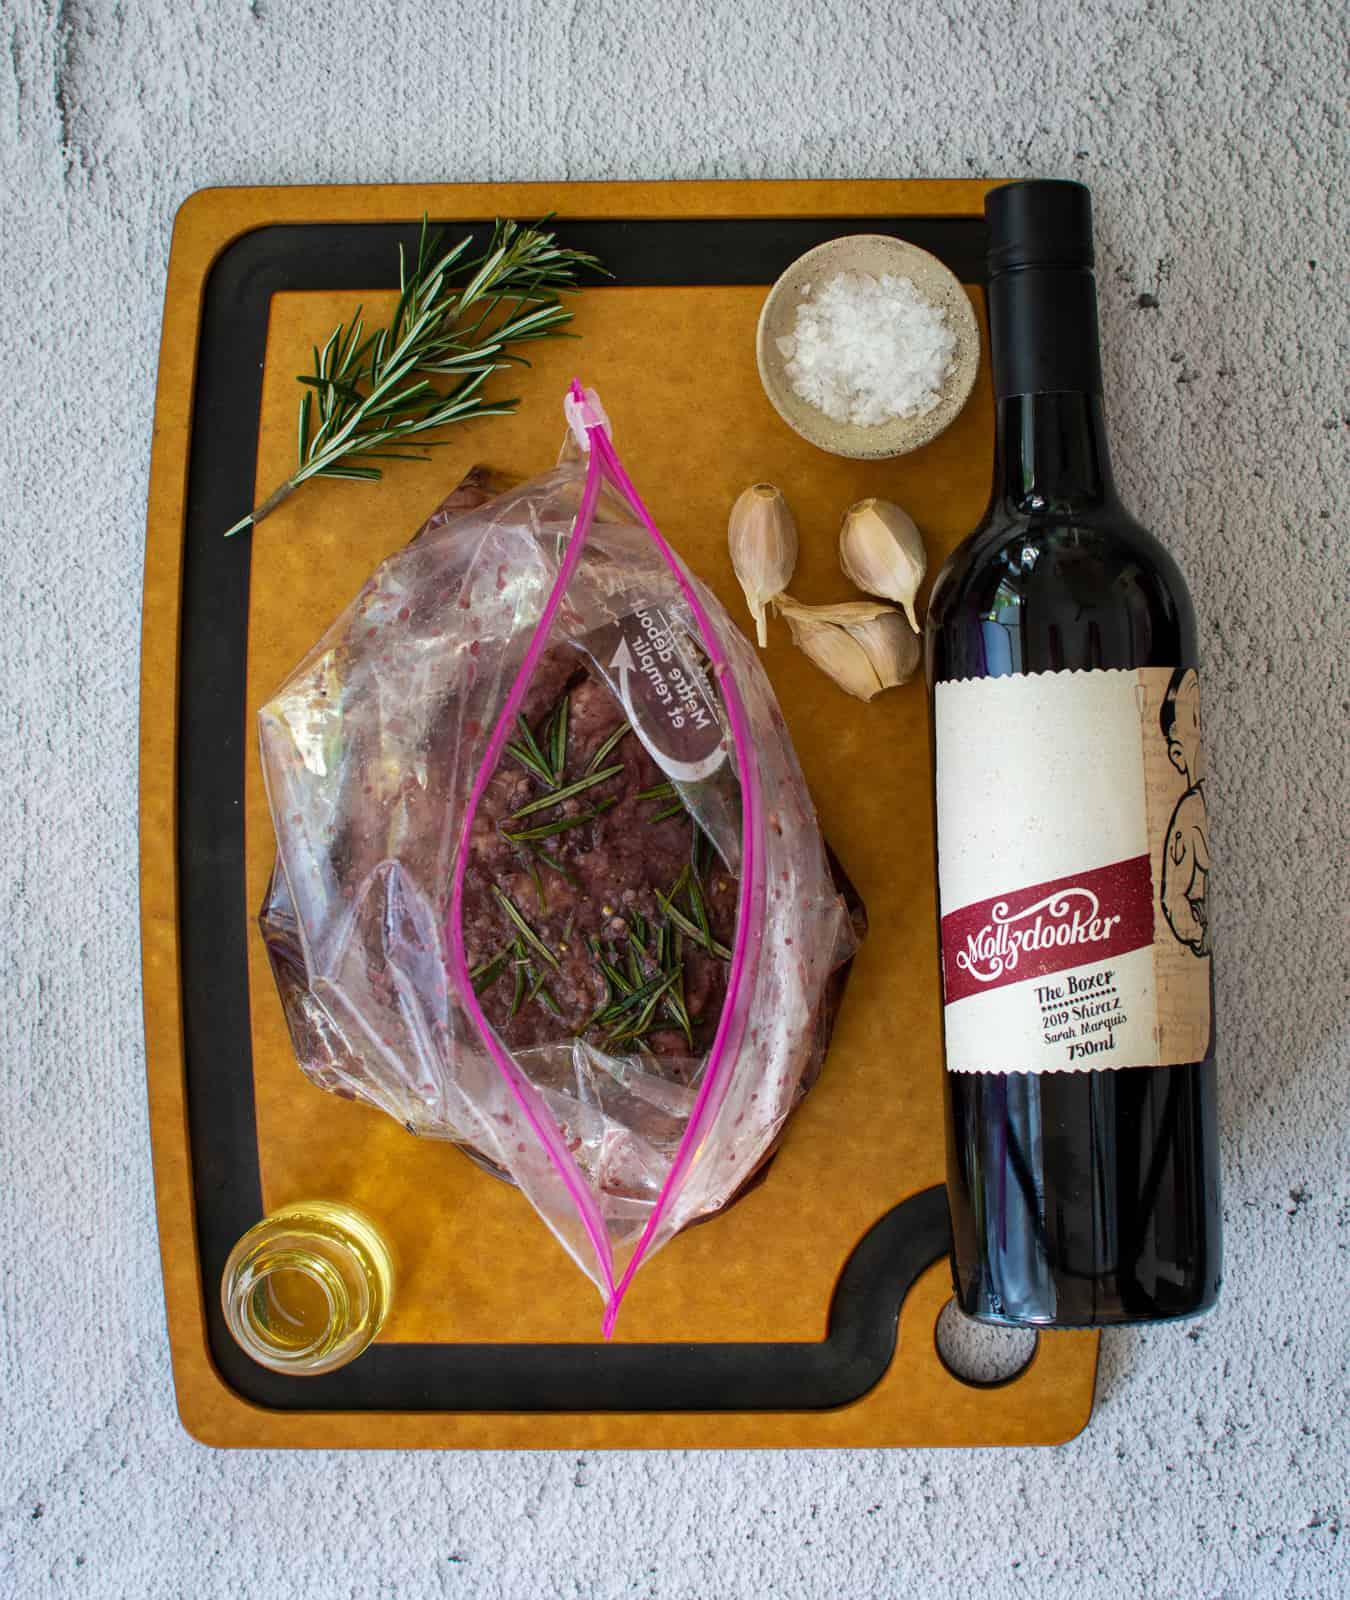 red wine marinated steak & mollydooker wine